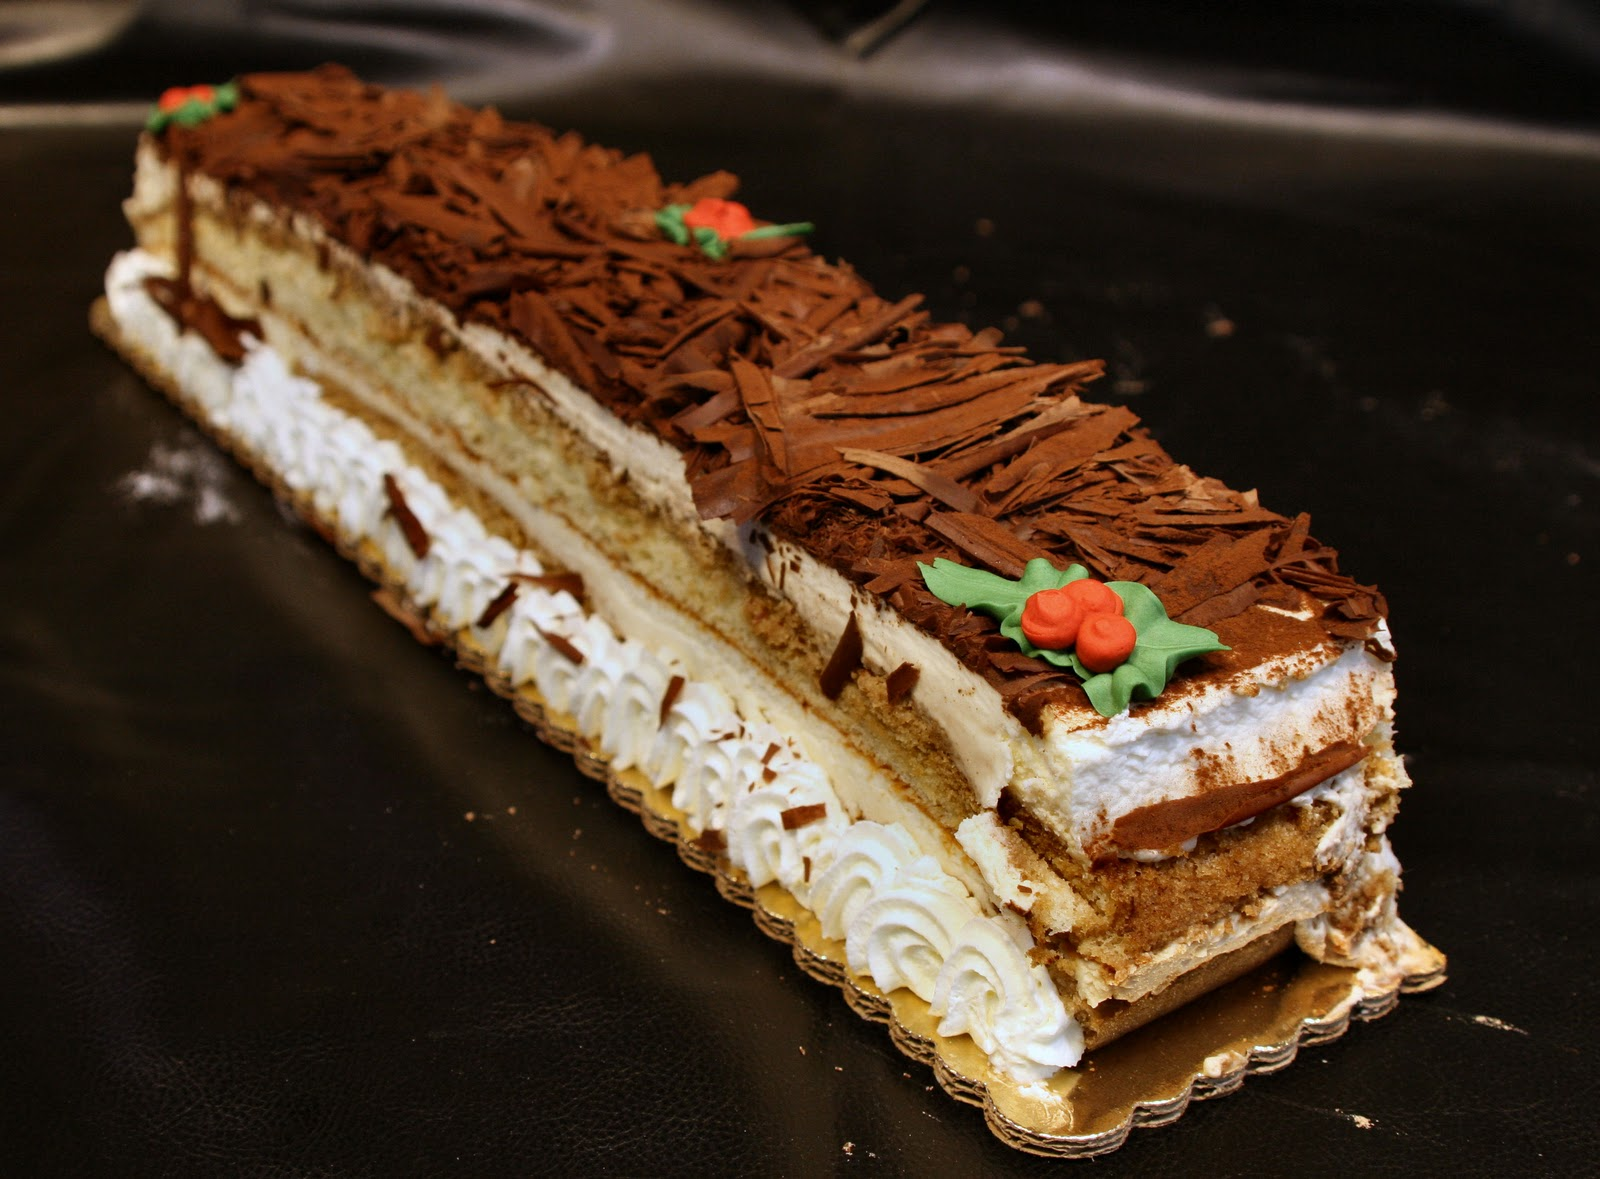 Cream Cake Recipe In English: Dessert Works Bakery: December 2010